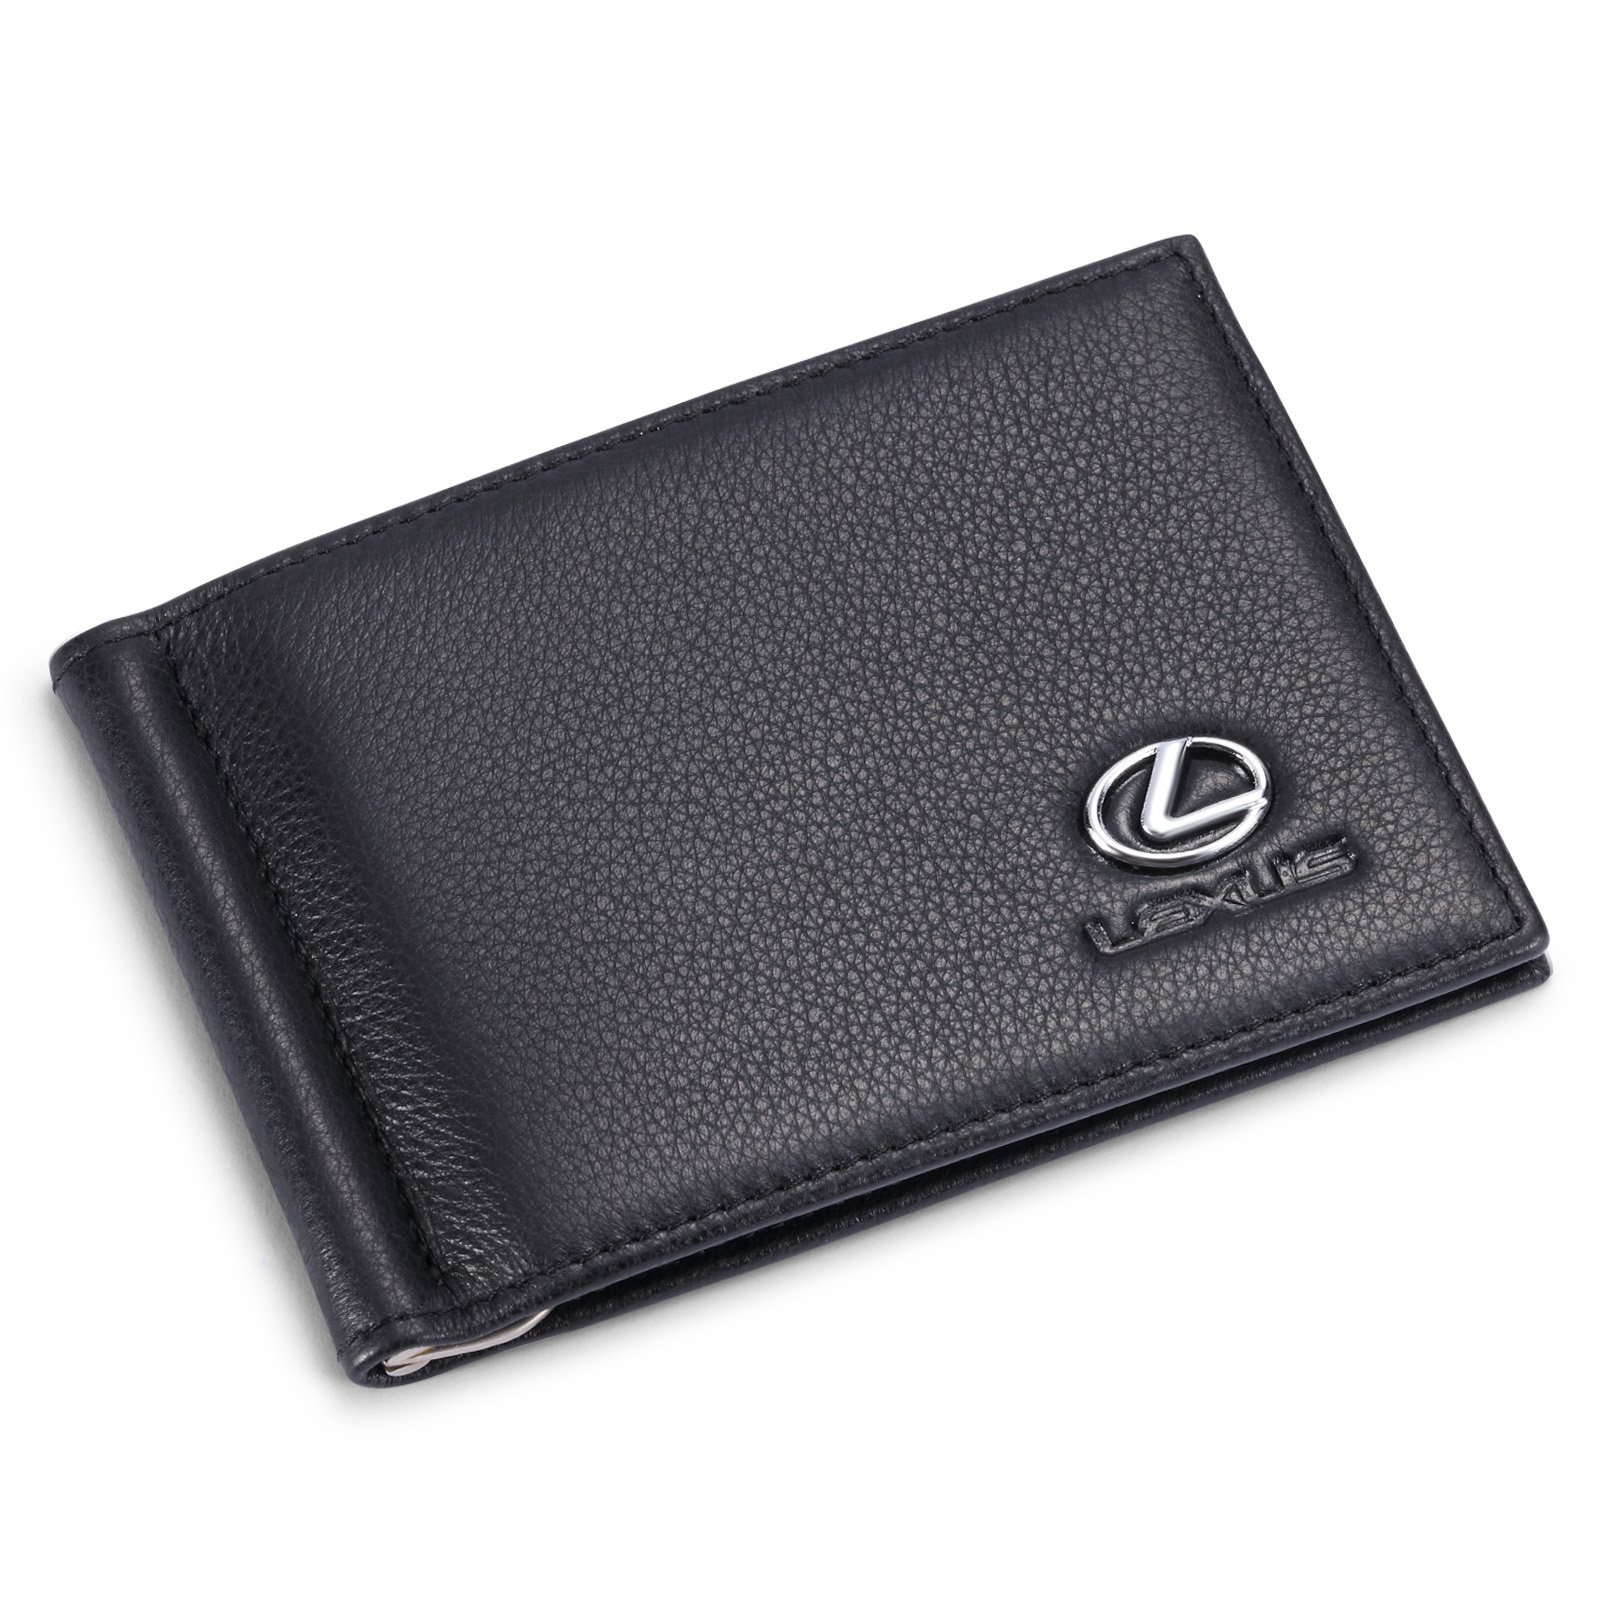 Galleon Lexus Bifold Money Clip Wallet With 6 Credit Card Slots